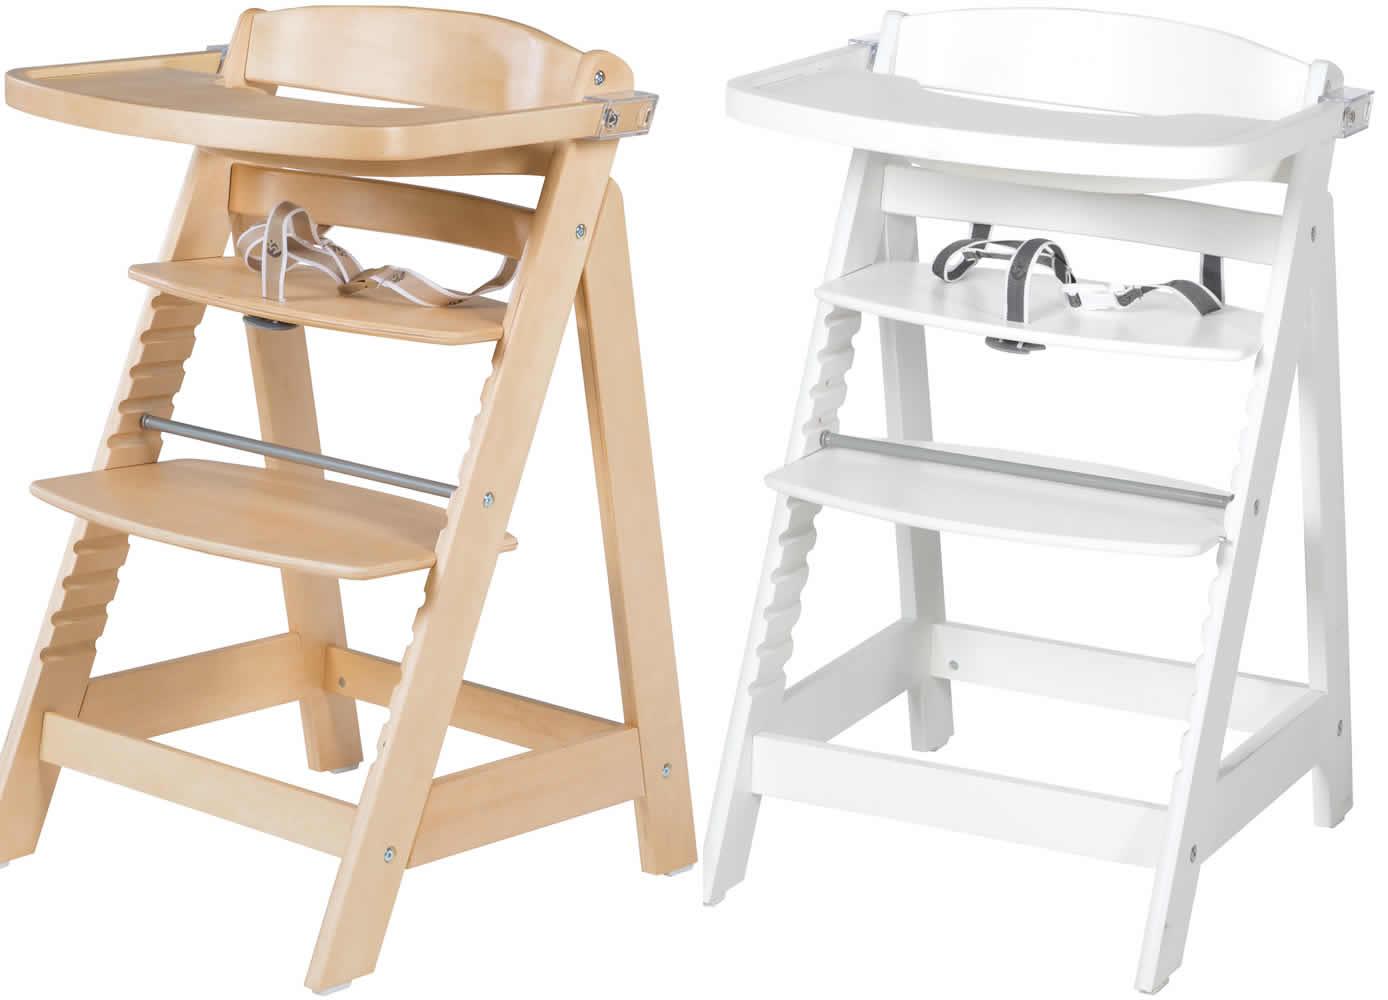 roba kinder treppen hochstuhl sit up fun mitwachsend holz ebay. Black Bedroom Furniture Sets. Home Design Ideas